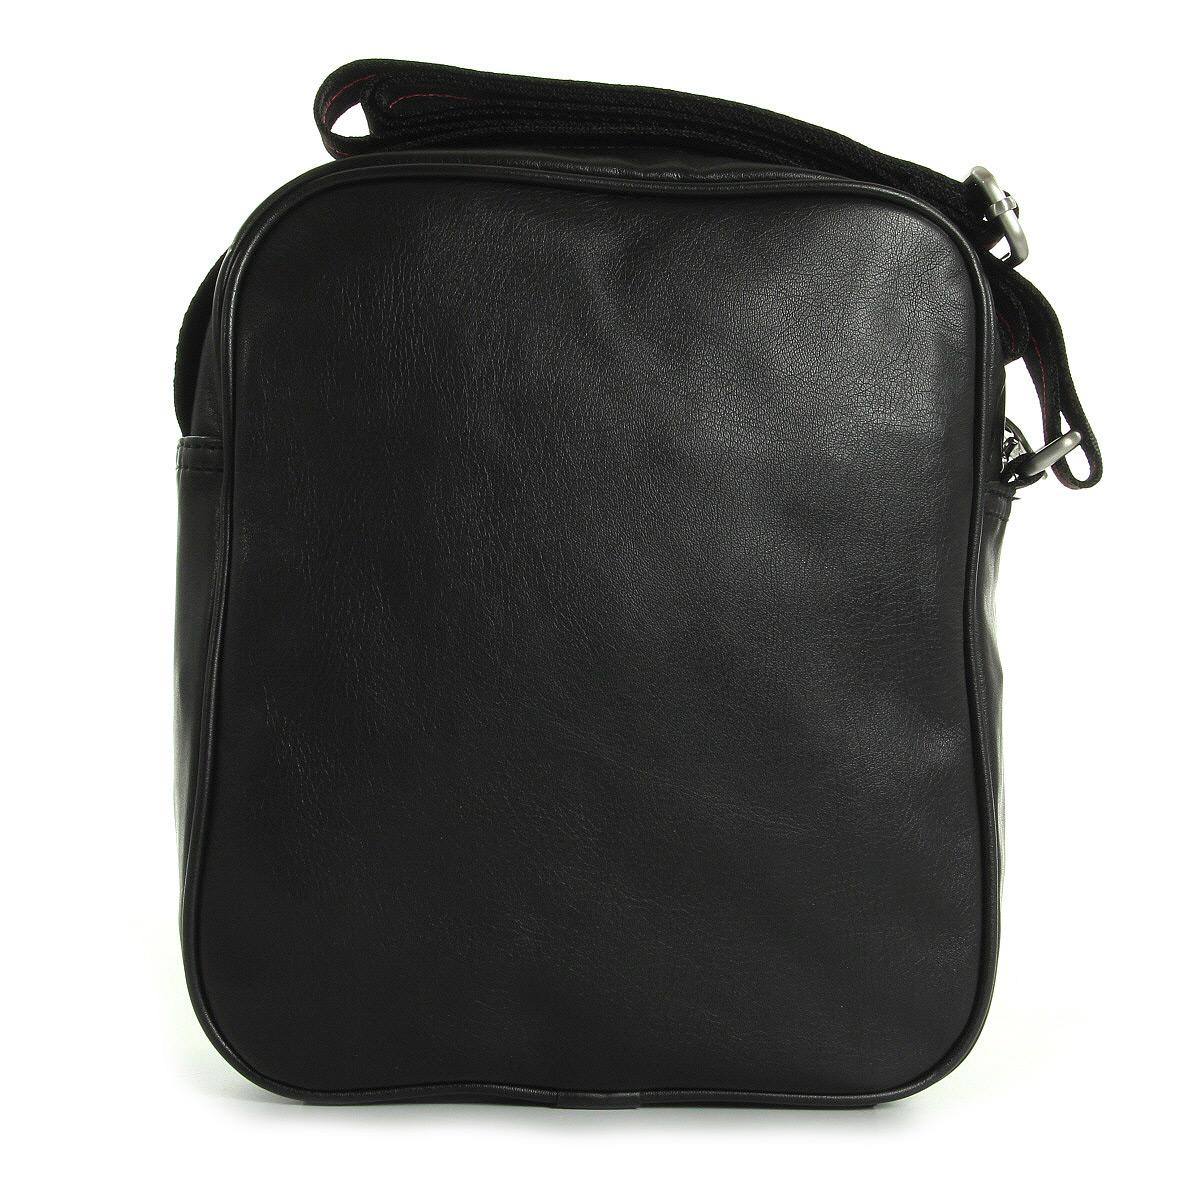 puma ferrari ls portable 07349201 sacs bandouli re sacoches unisexe. Black Bedroom Furniture Sets. Home Design Ideas